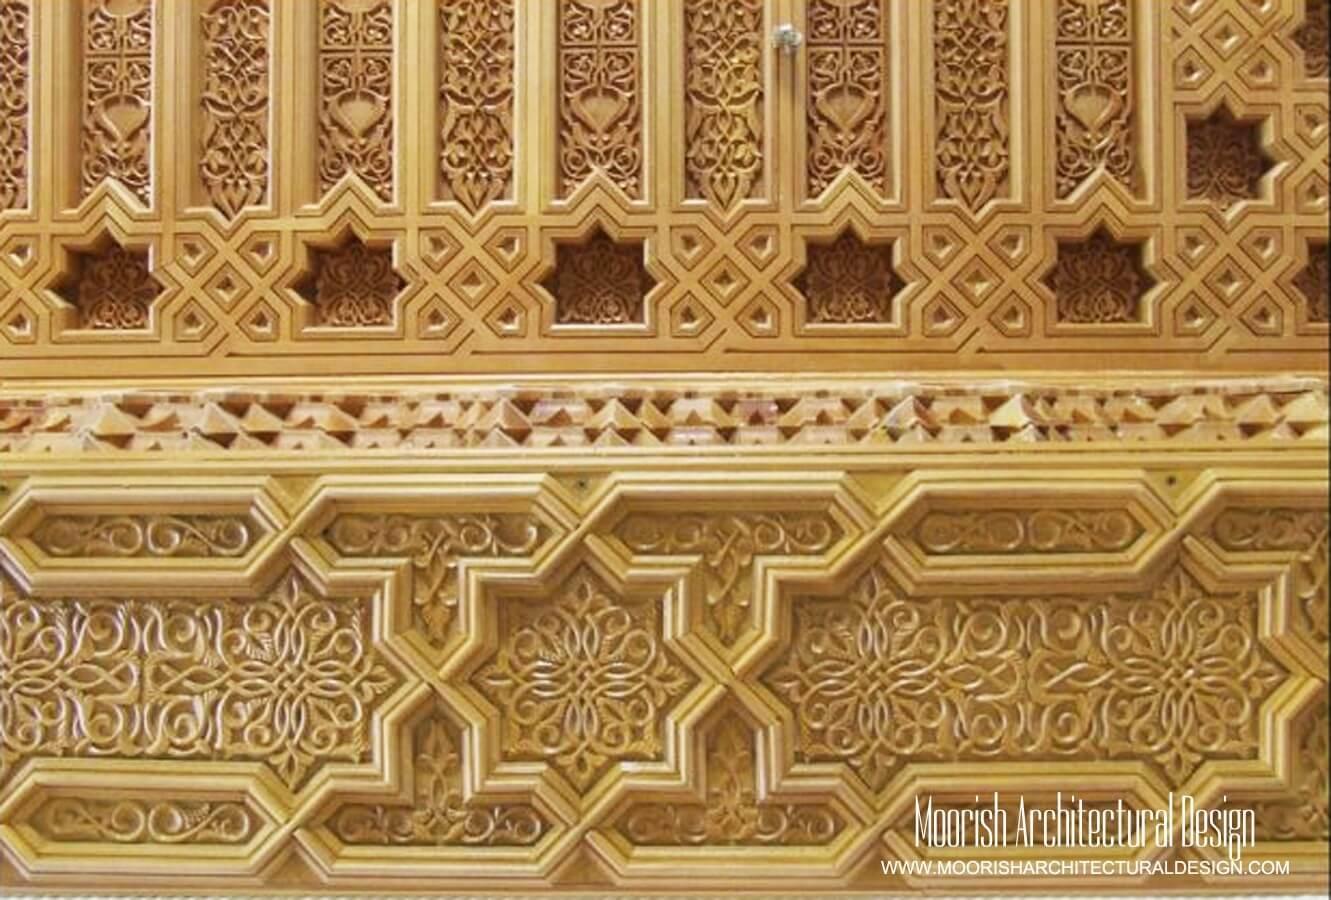 Moroccan decorative wood mouldings - Moorish crown molding